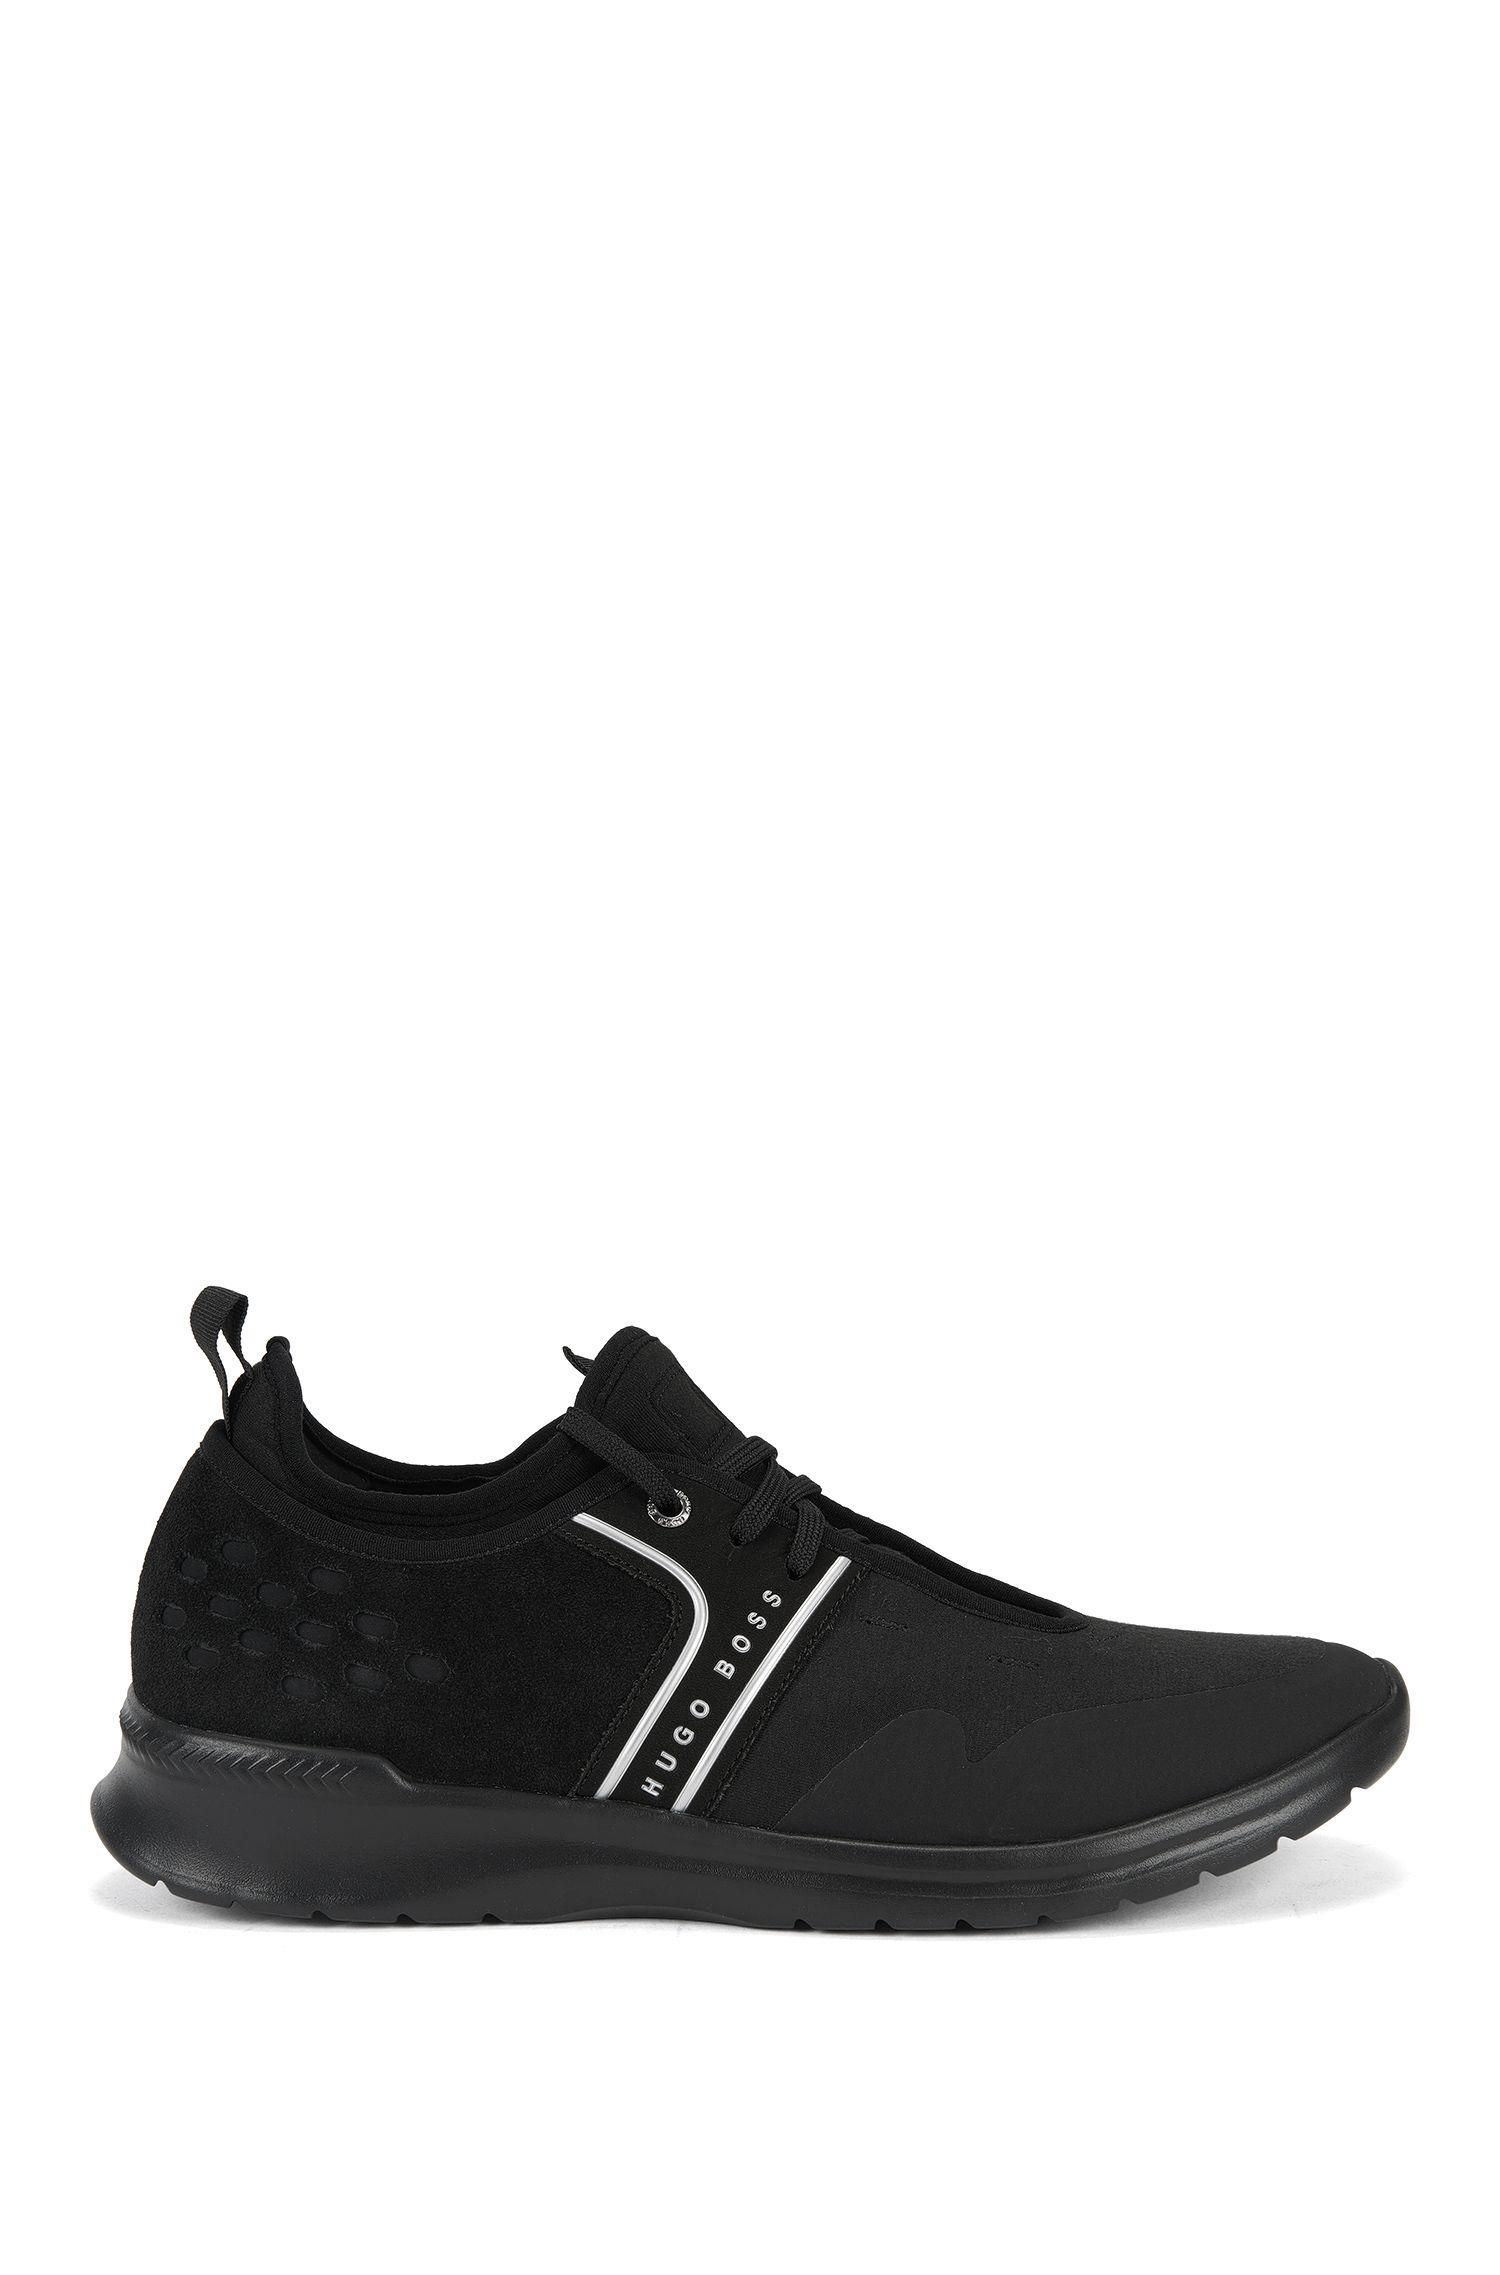 High-Performance Sneaker | Extreme Runn Mxjs